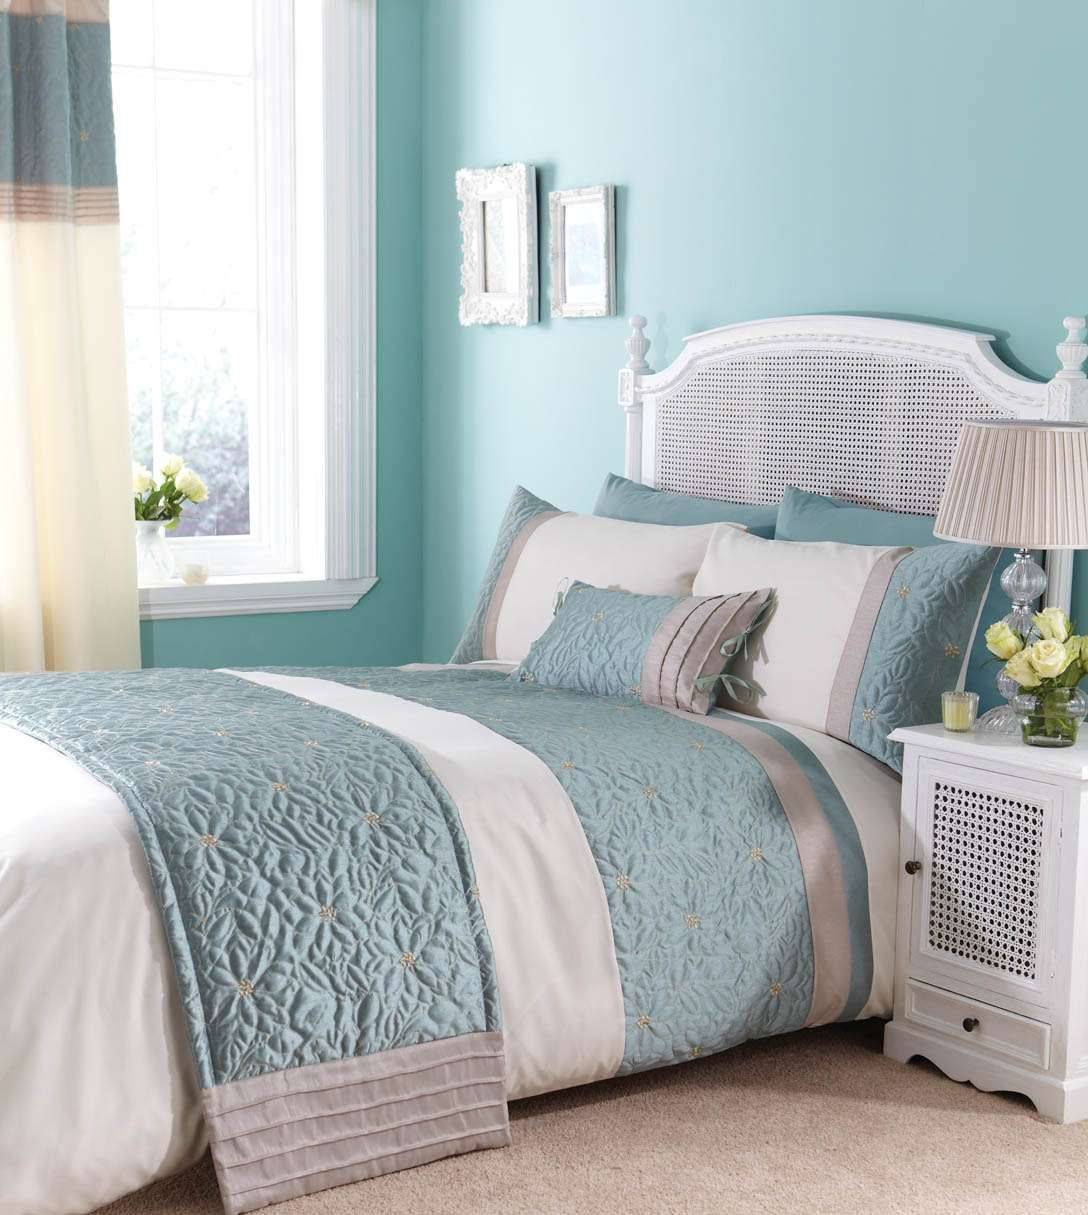 robins egg blue bedroom |  to tag duck-egg-blue-bedroom-ideas